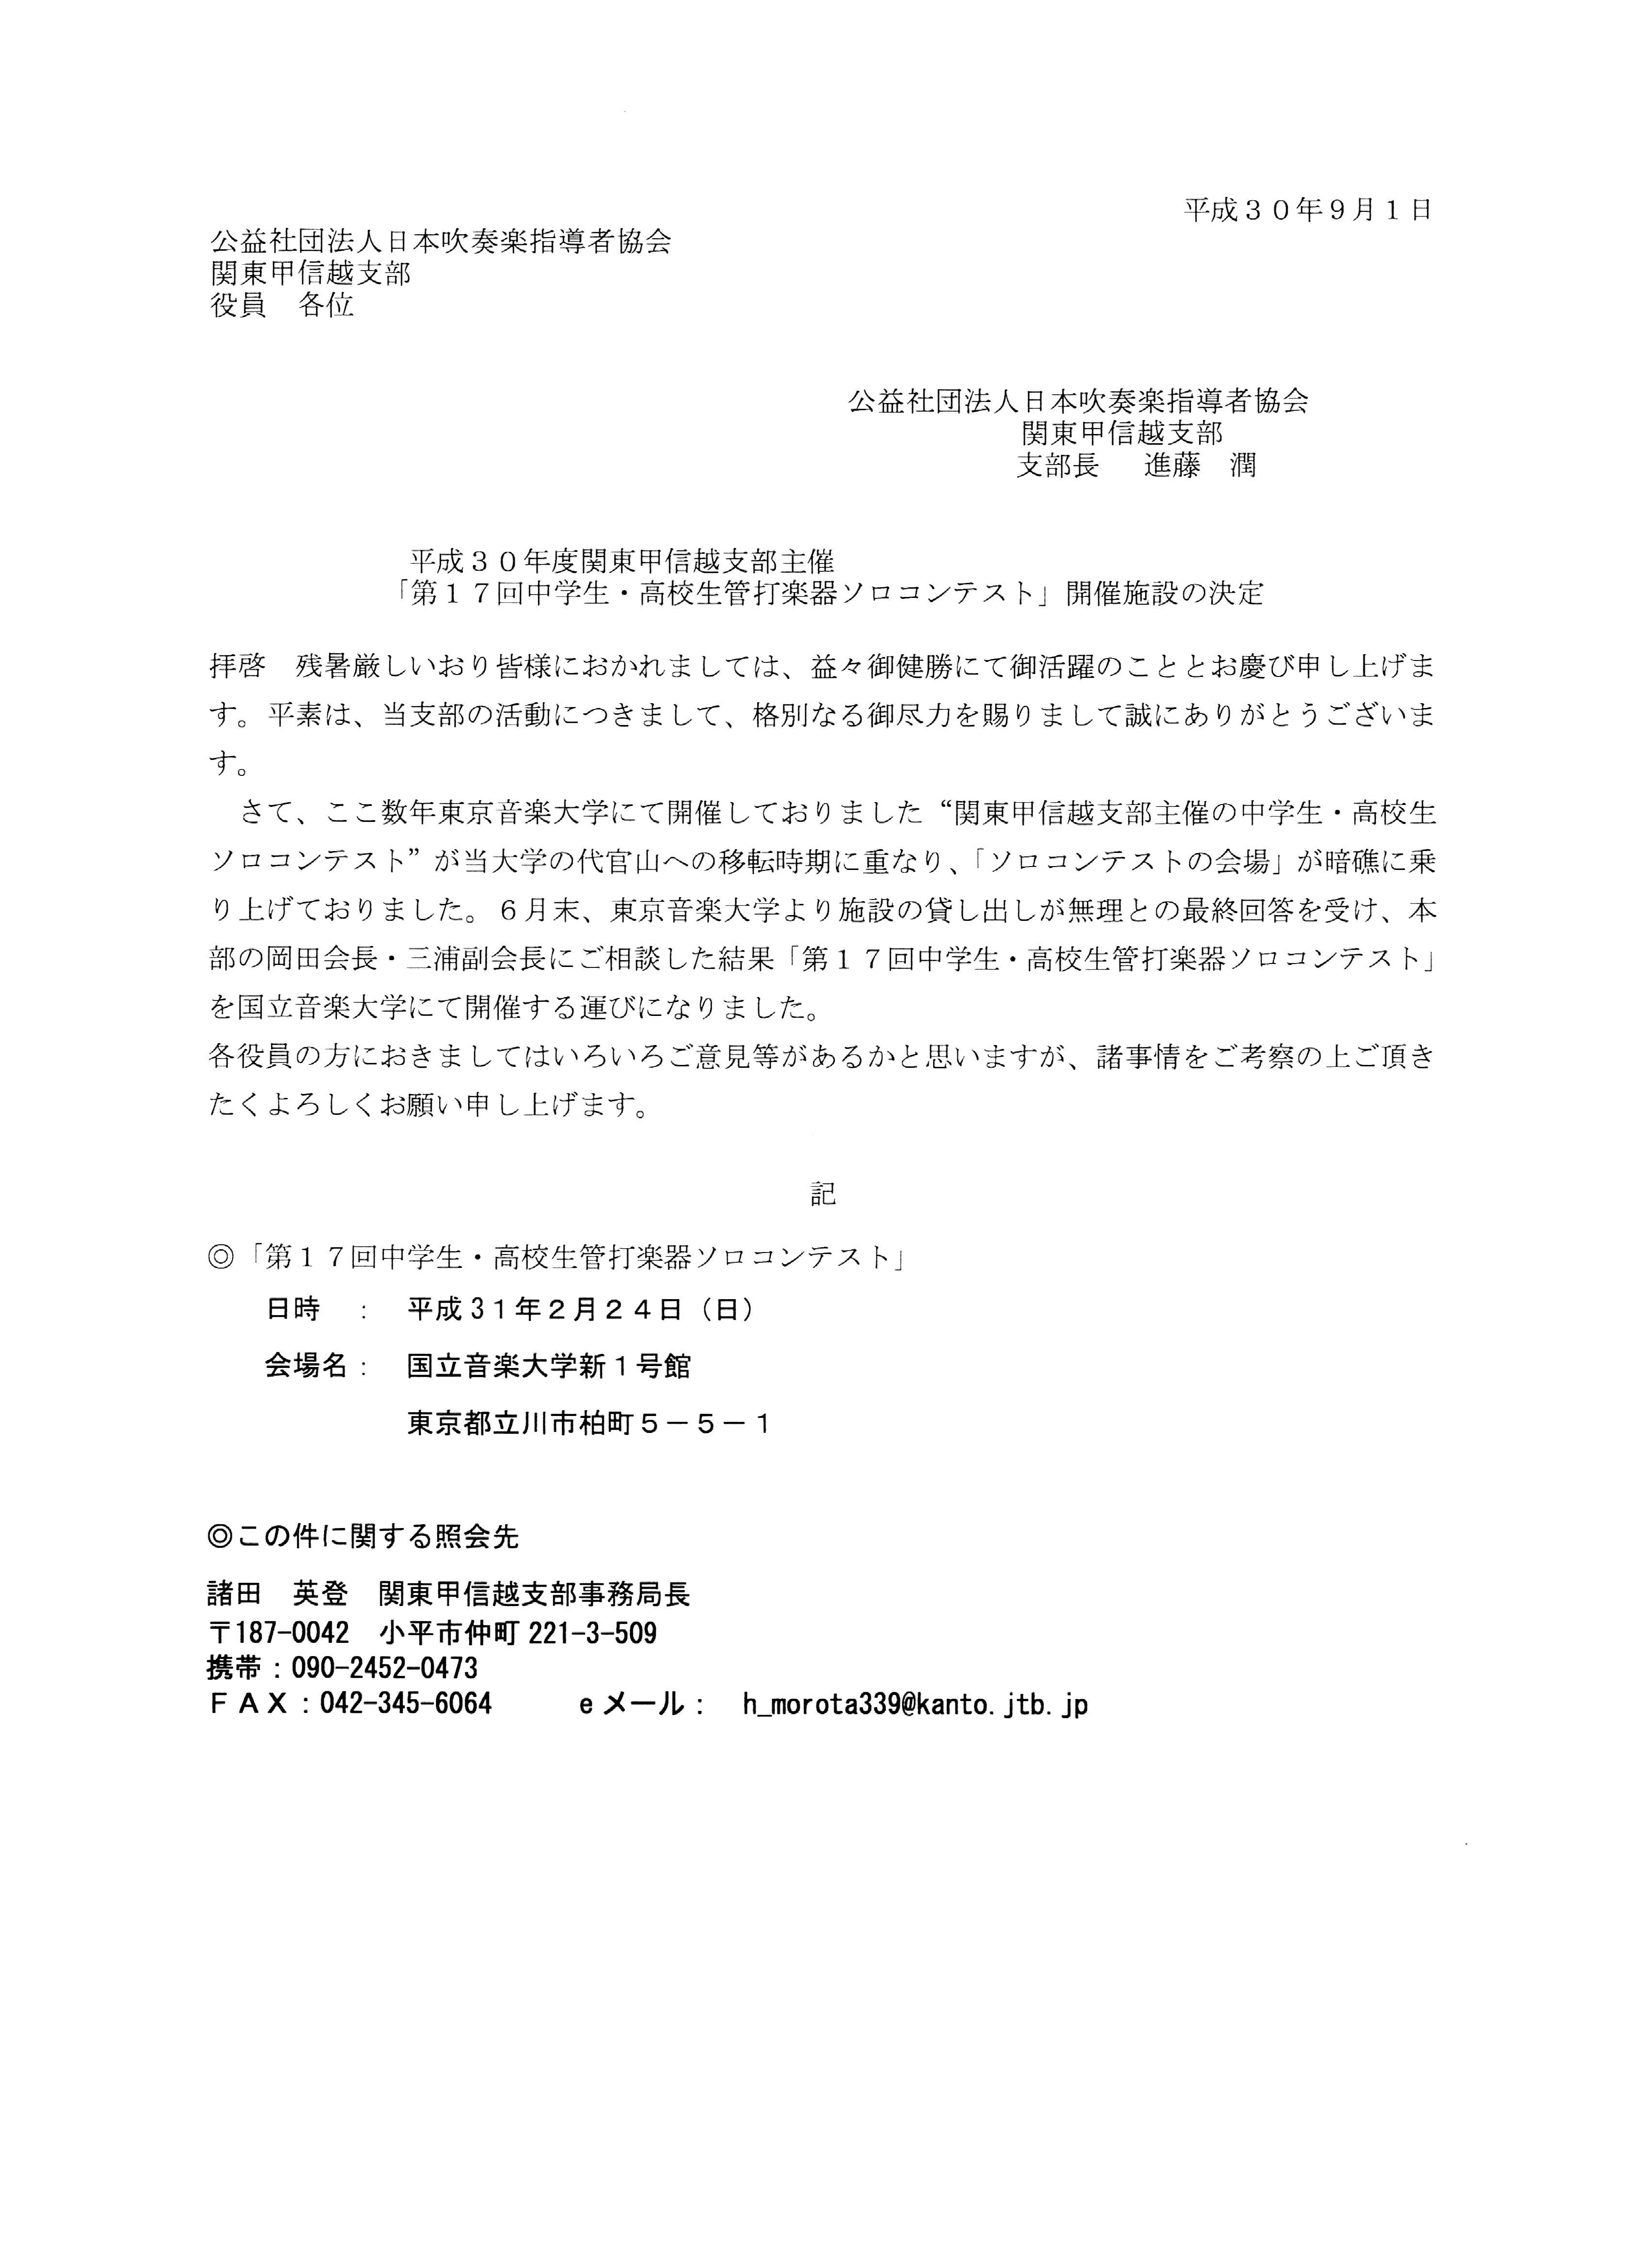 jba-tochigi – 公益社団法人日本...